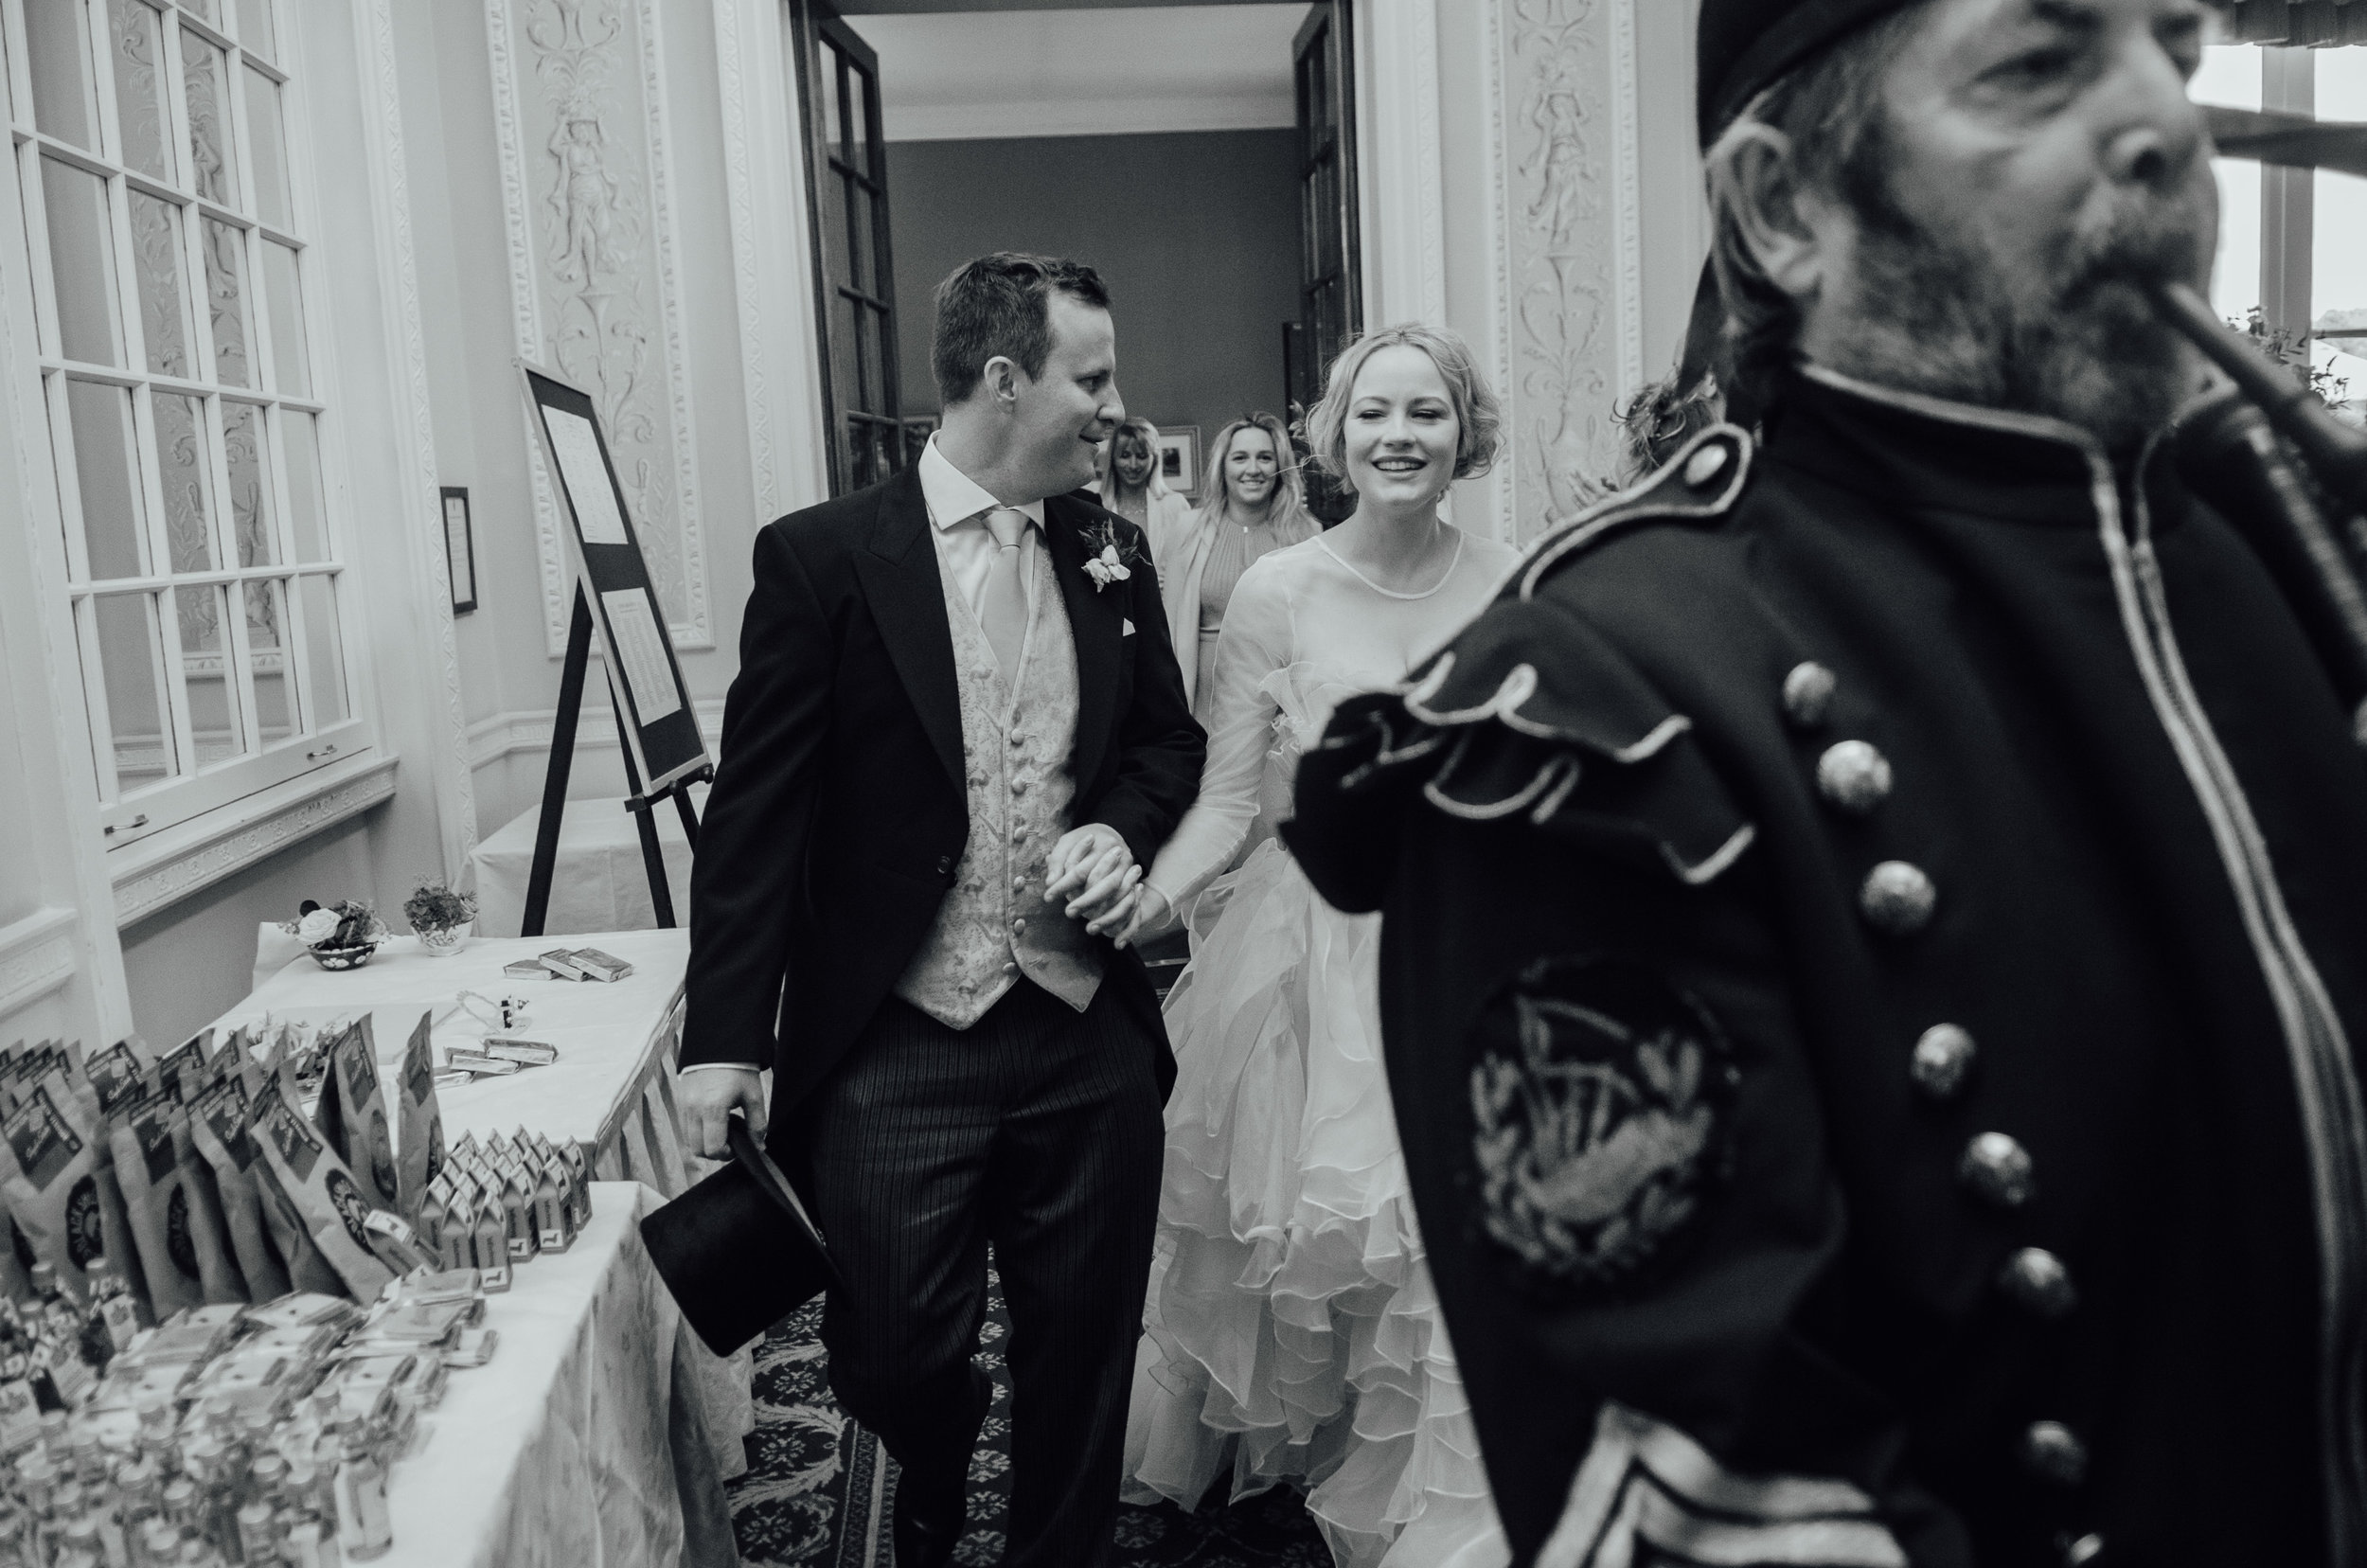 cleland-studios-wedding-photography-75.jpg